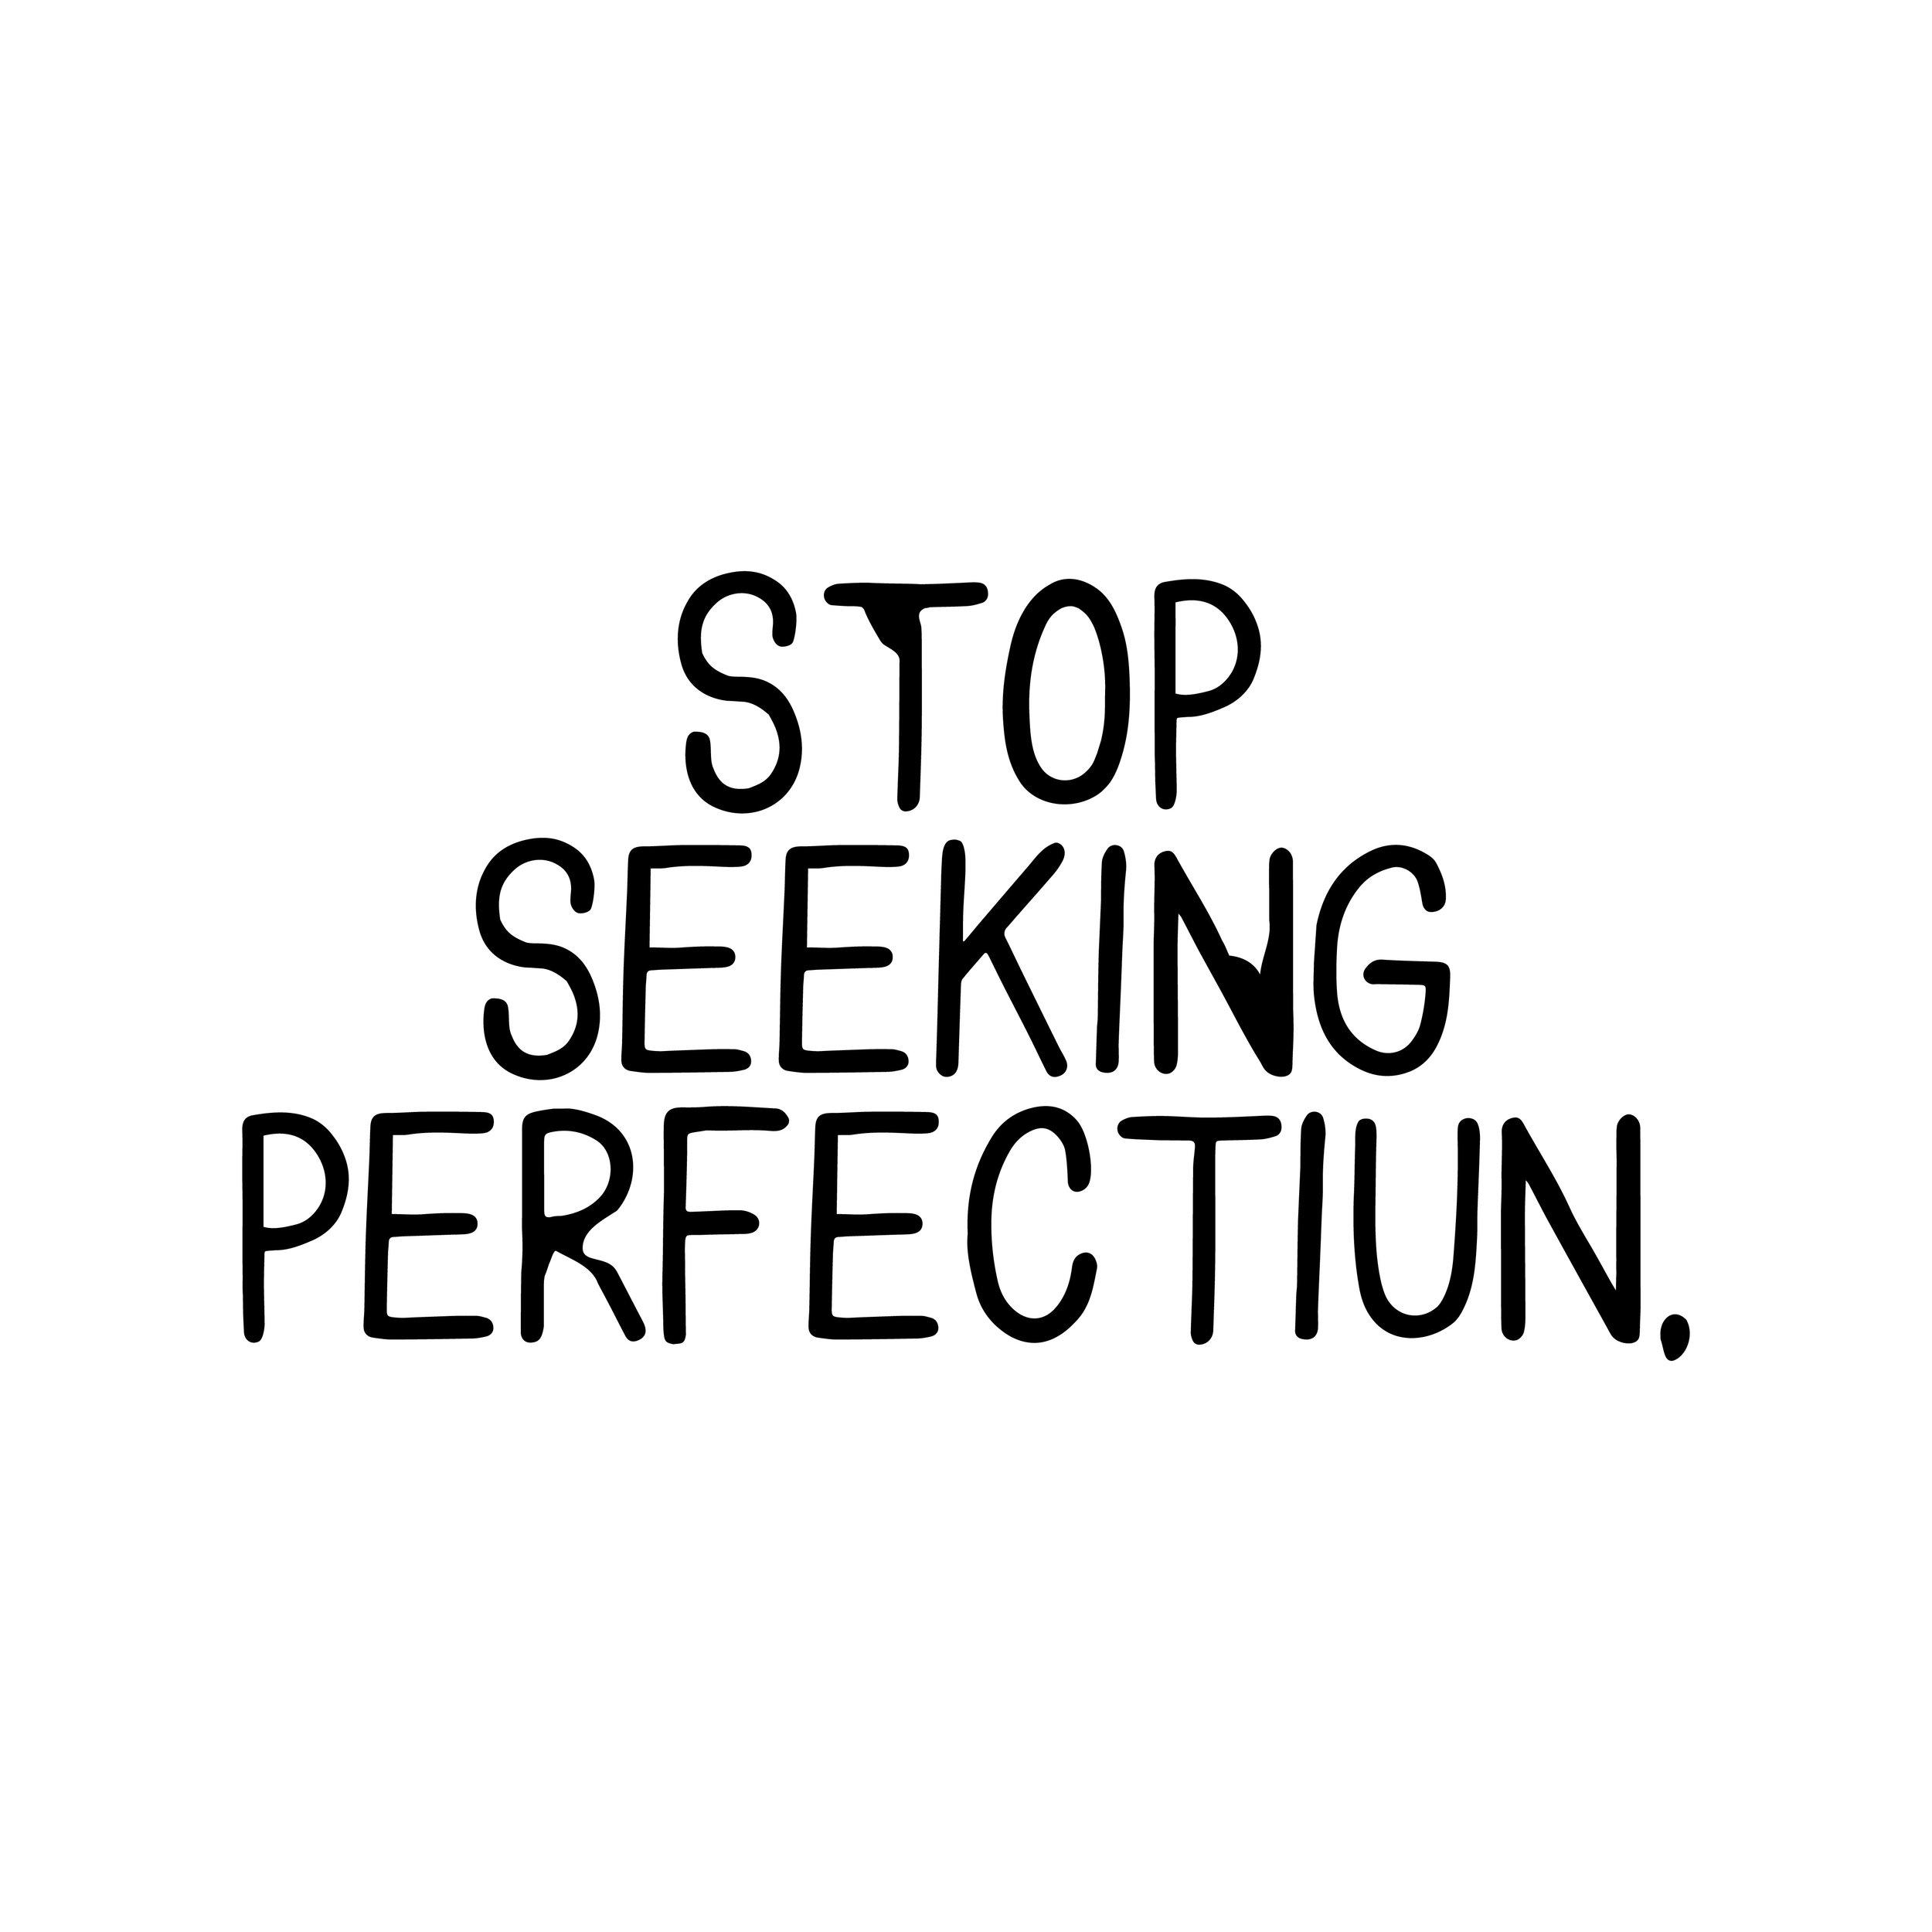 perfection-01.jpg